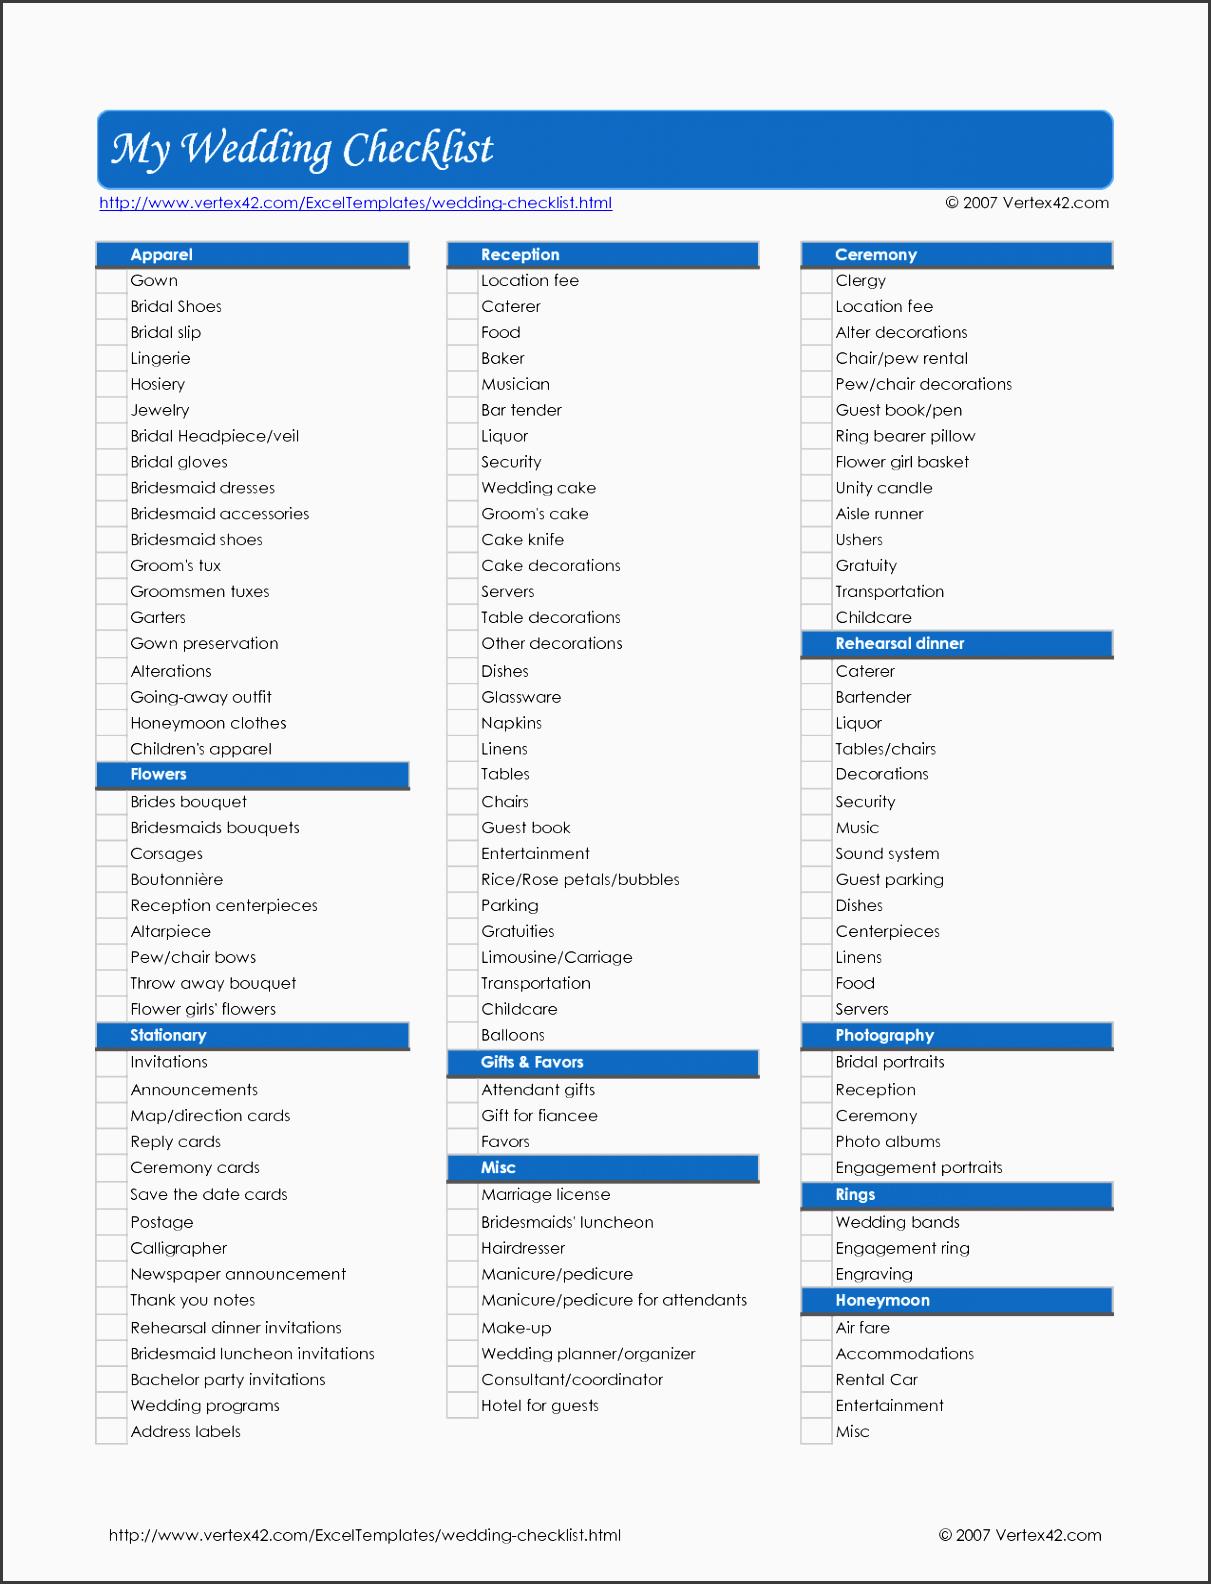 free wedding checklist template excel